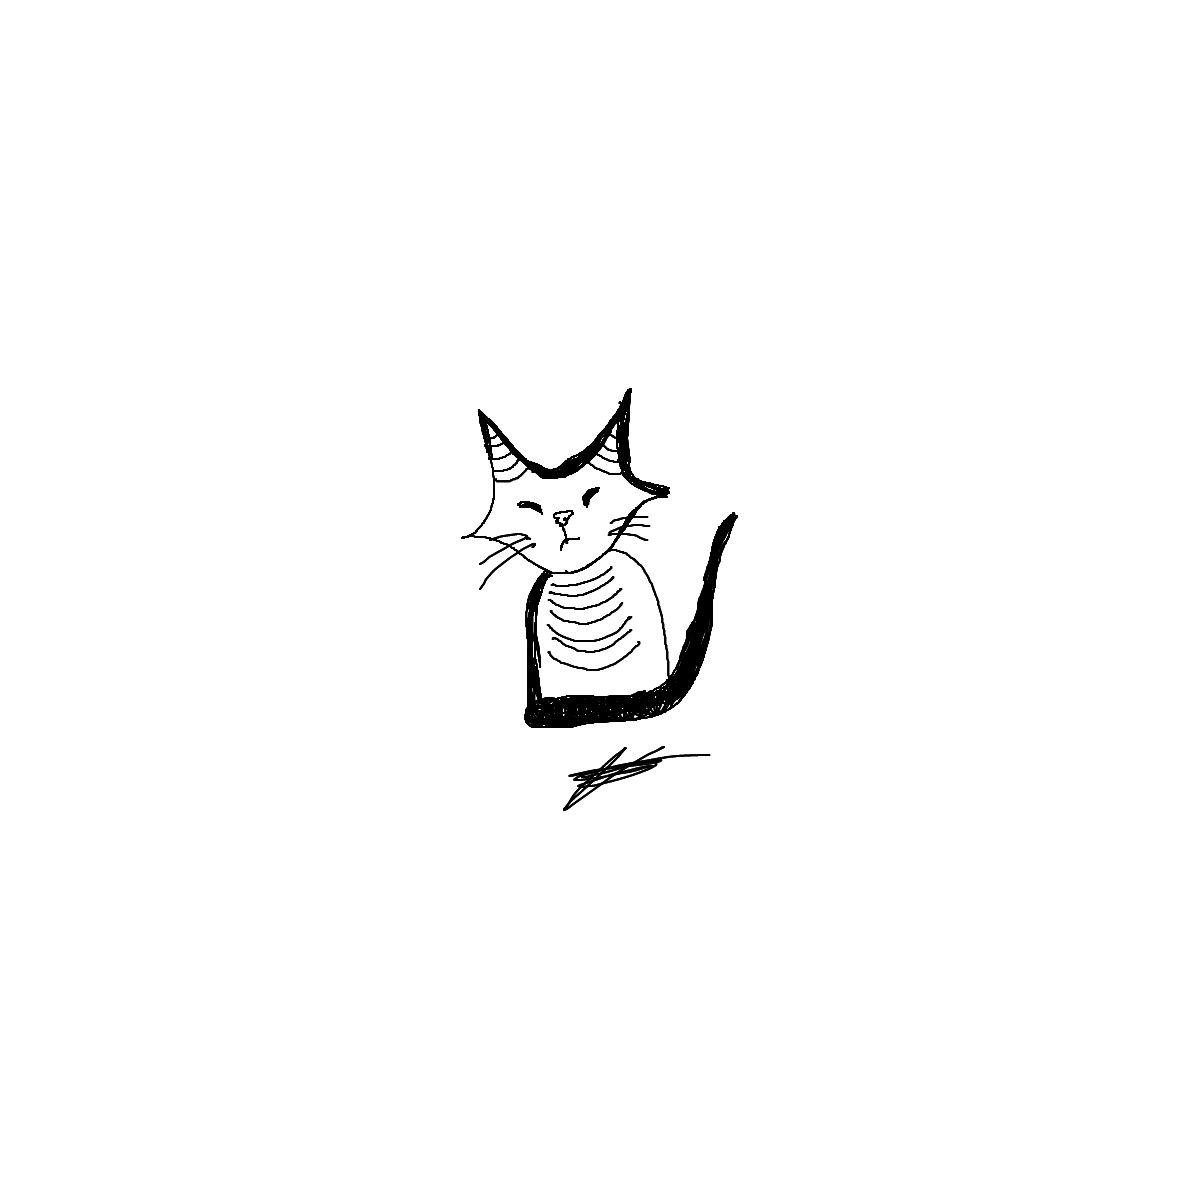 BAAAM drawing#20463 lat:49.4810752868652340lng: 6.0806398391723630